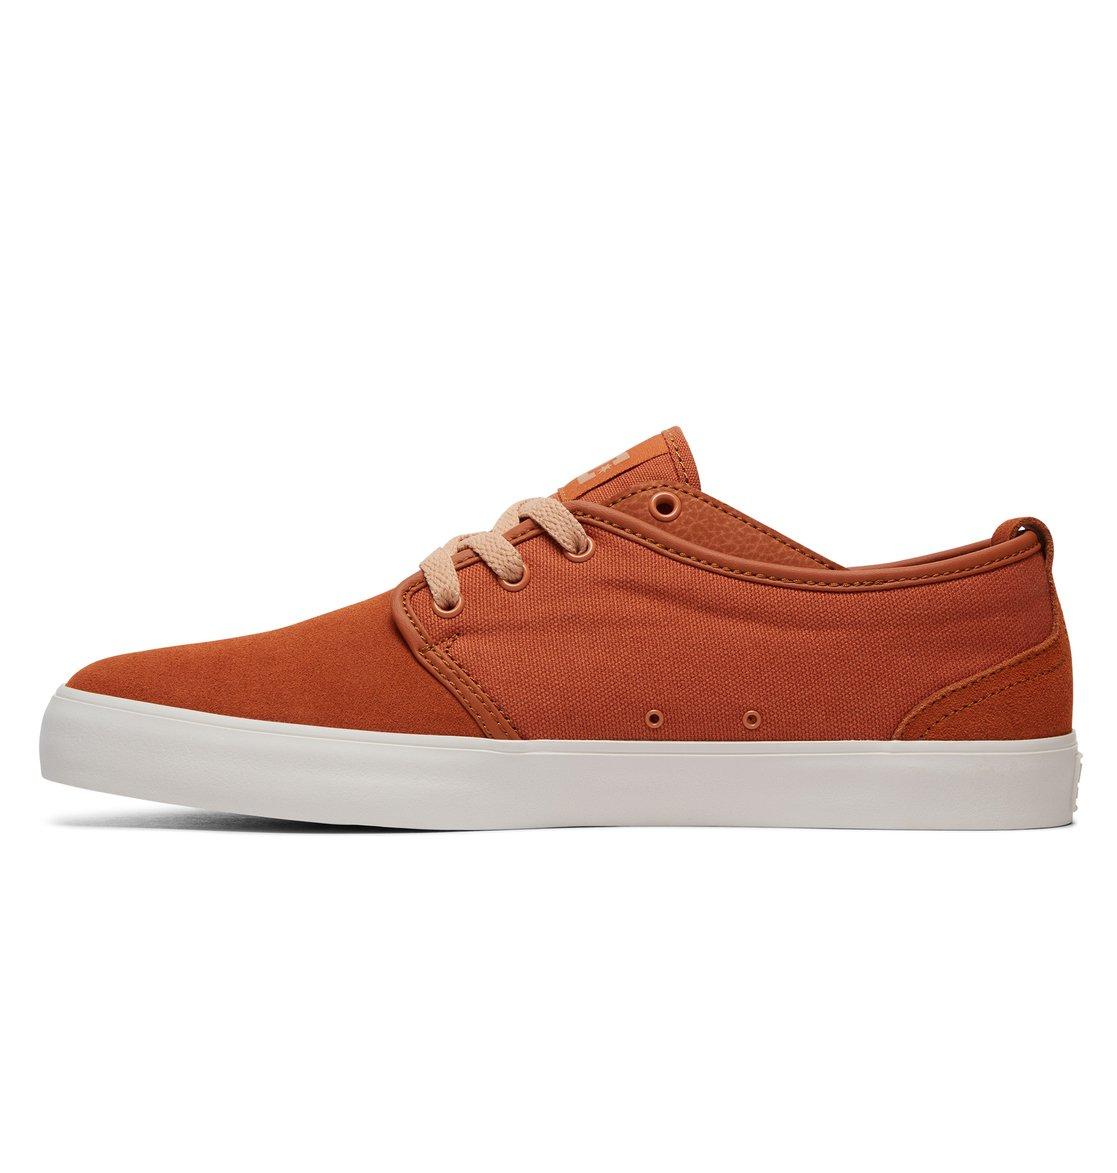 dc shoes Studio 2 LE - Scarpe da Uomo - Red - DC Shoes BVCAs9